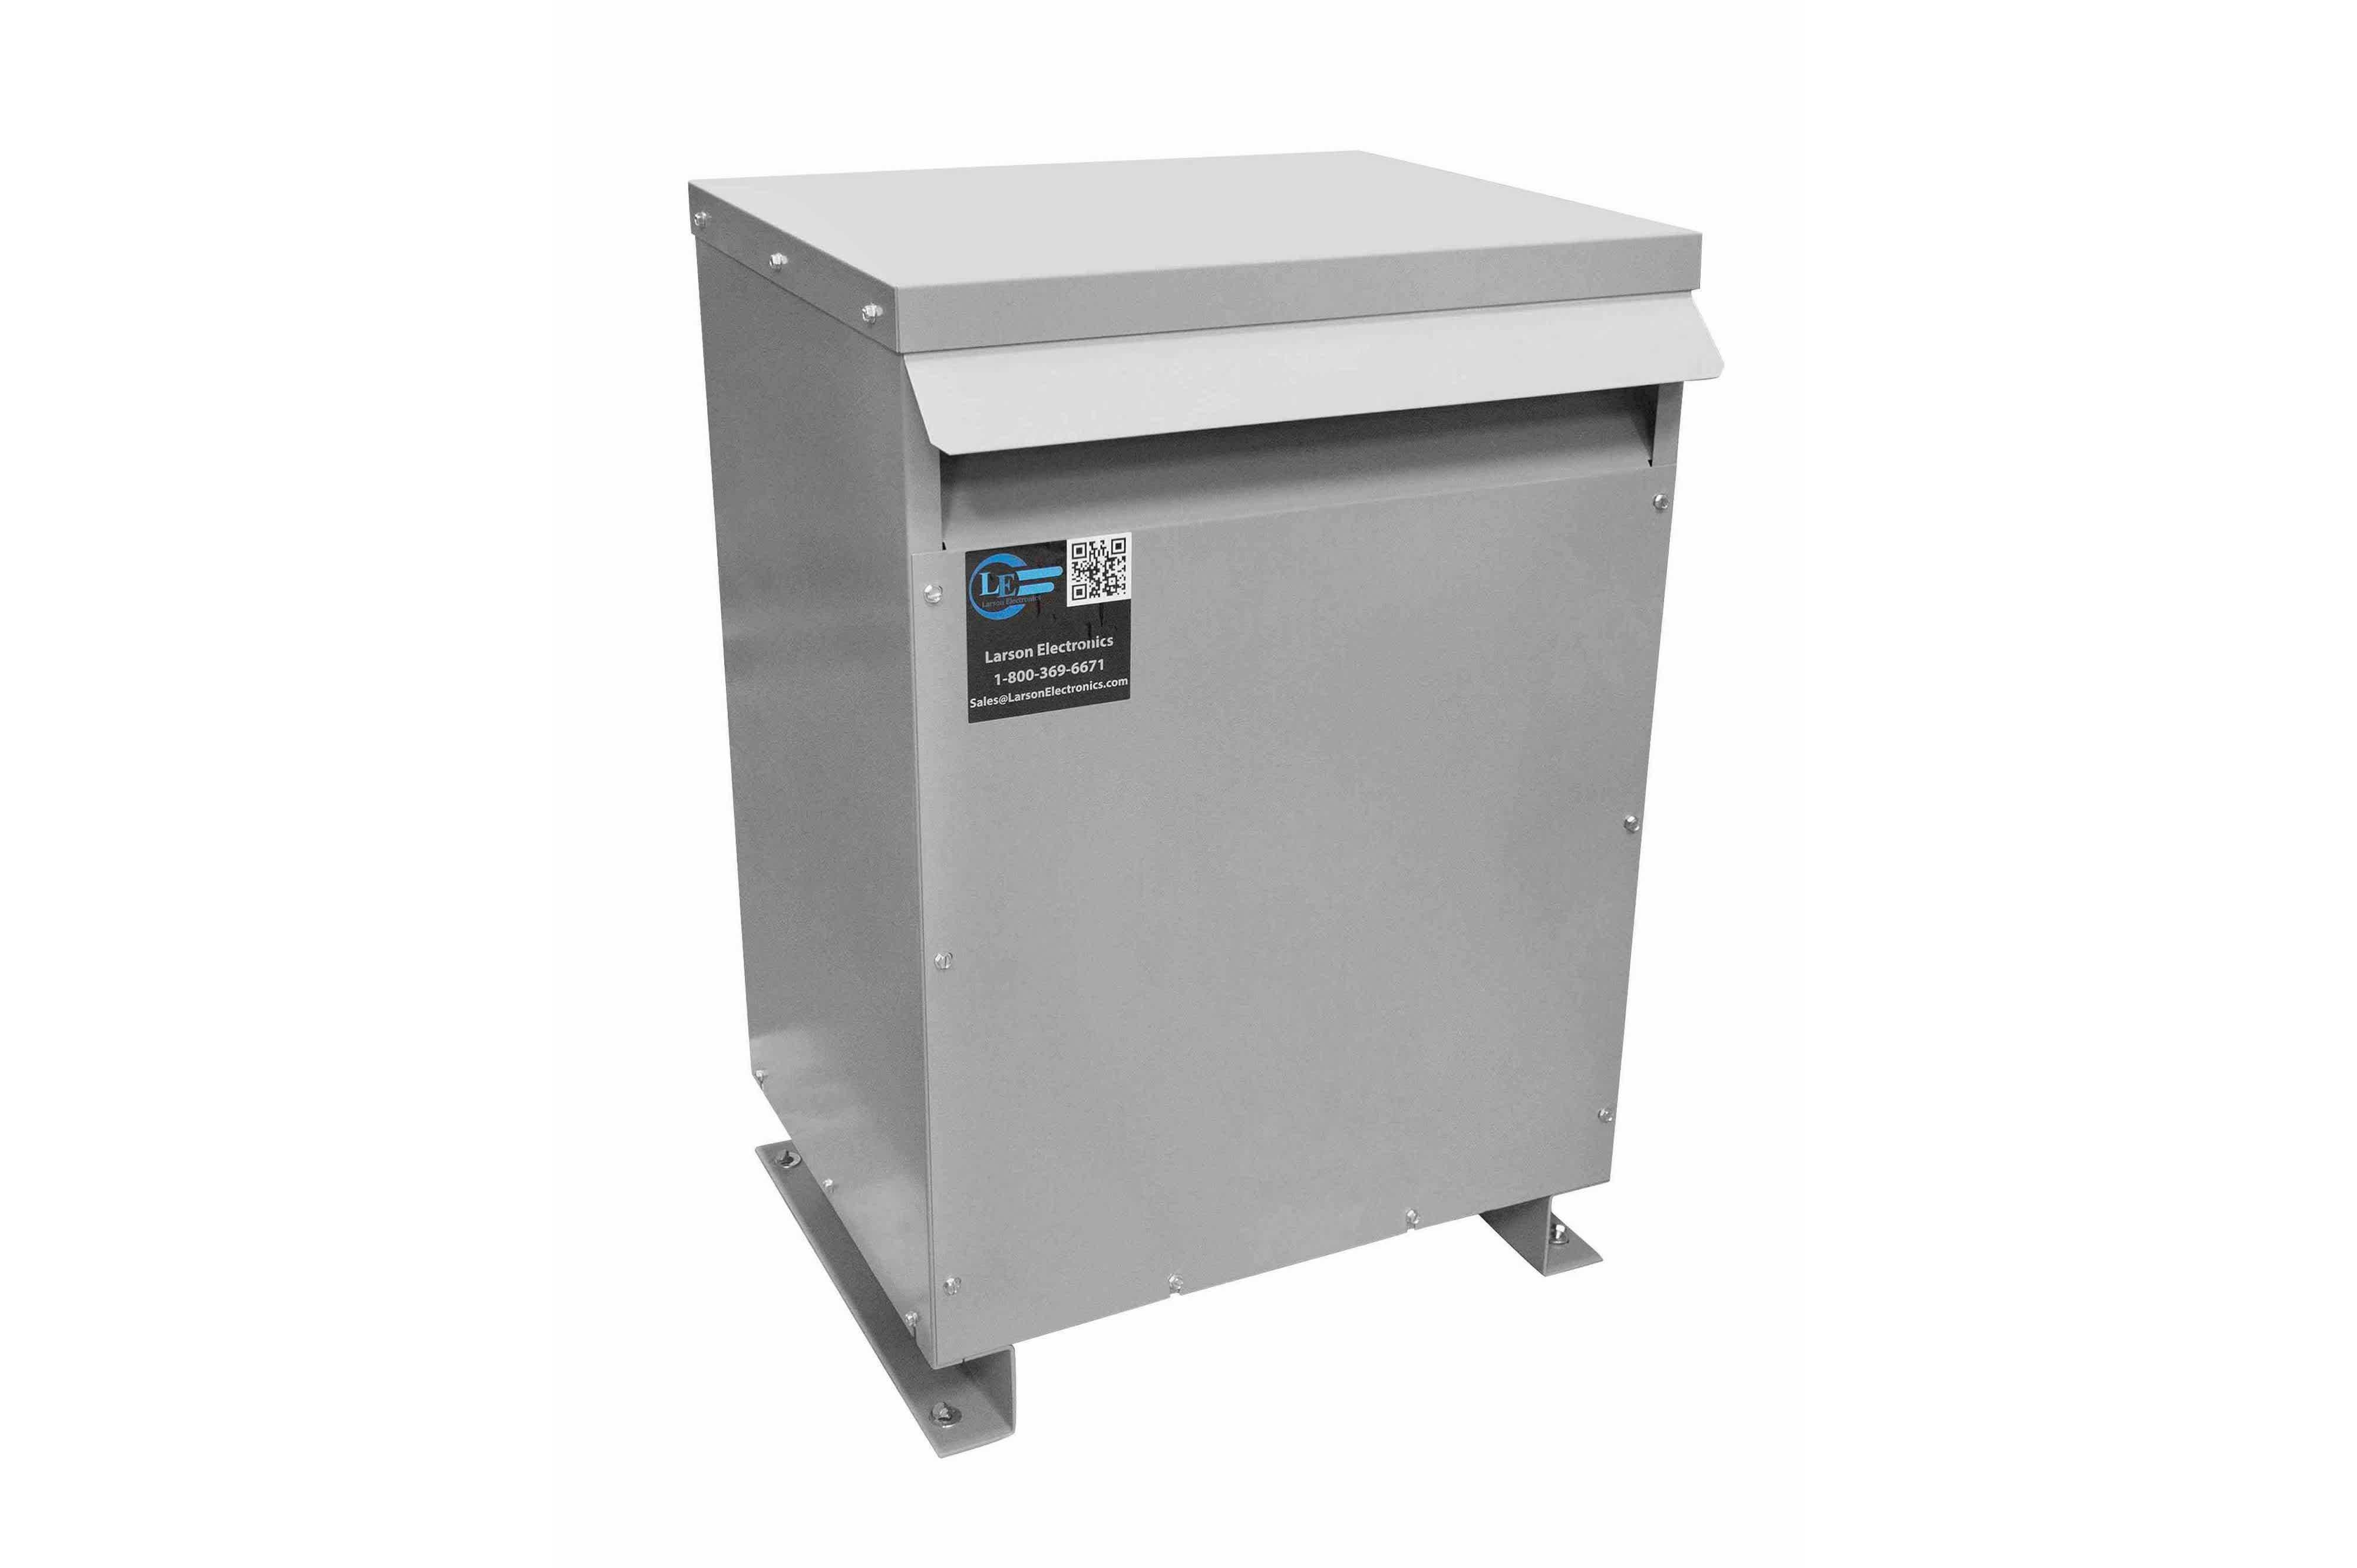 26 kVA 3PH Isolation Transformer, 460V Wye Primary, 600V Delta Secondary, N3R, Ventilated, 60 Hz